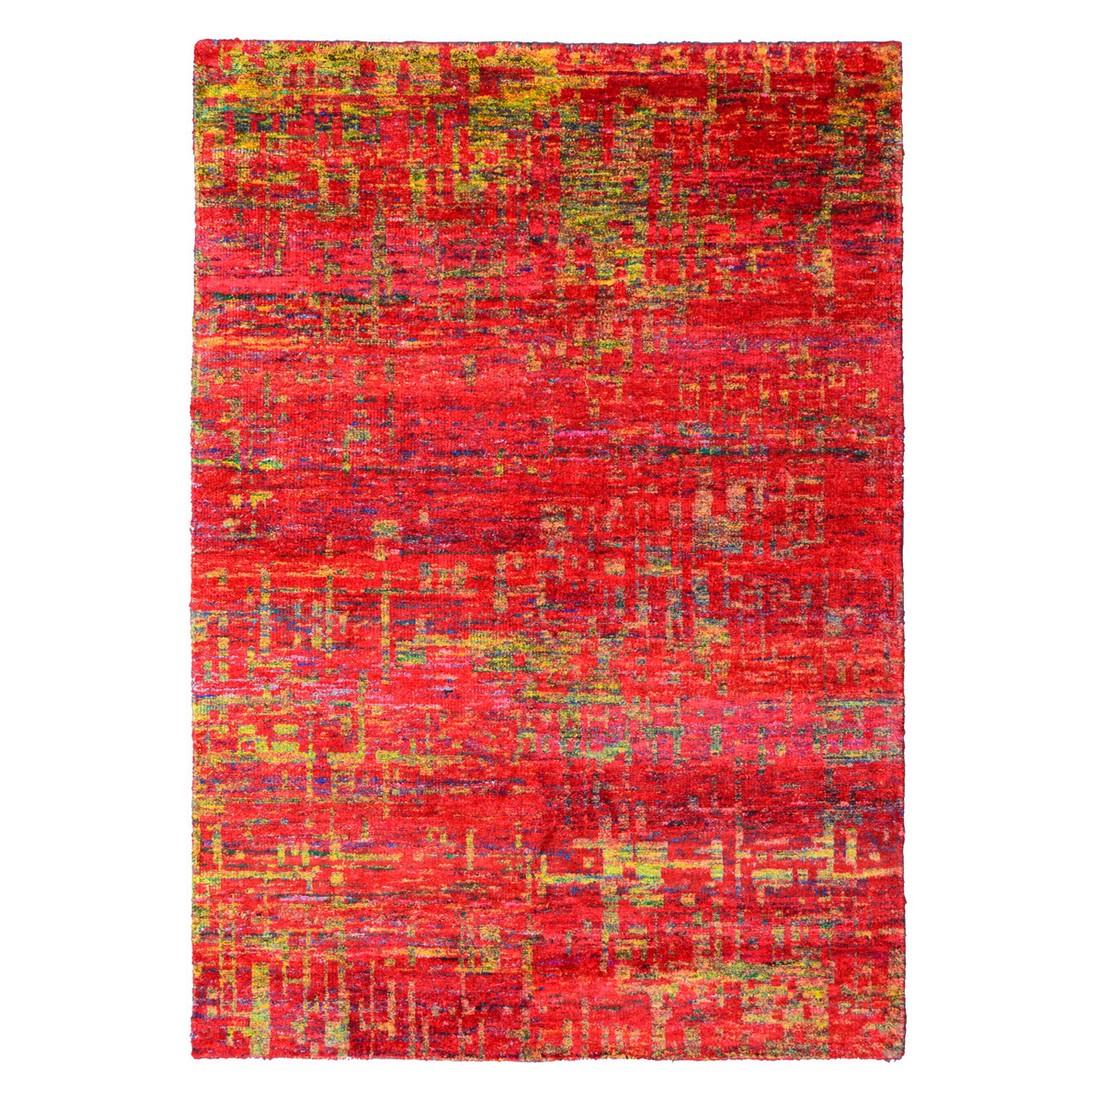 Teppich Maharani - Magma - 200 x 290 cm, Obsession